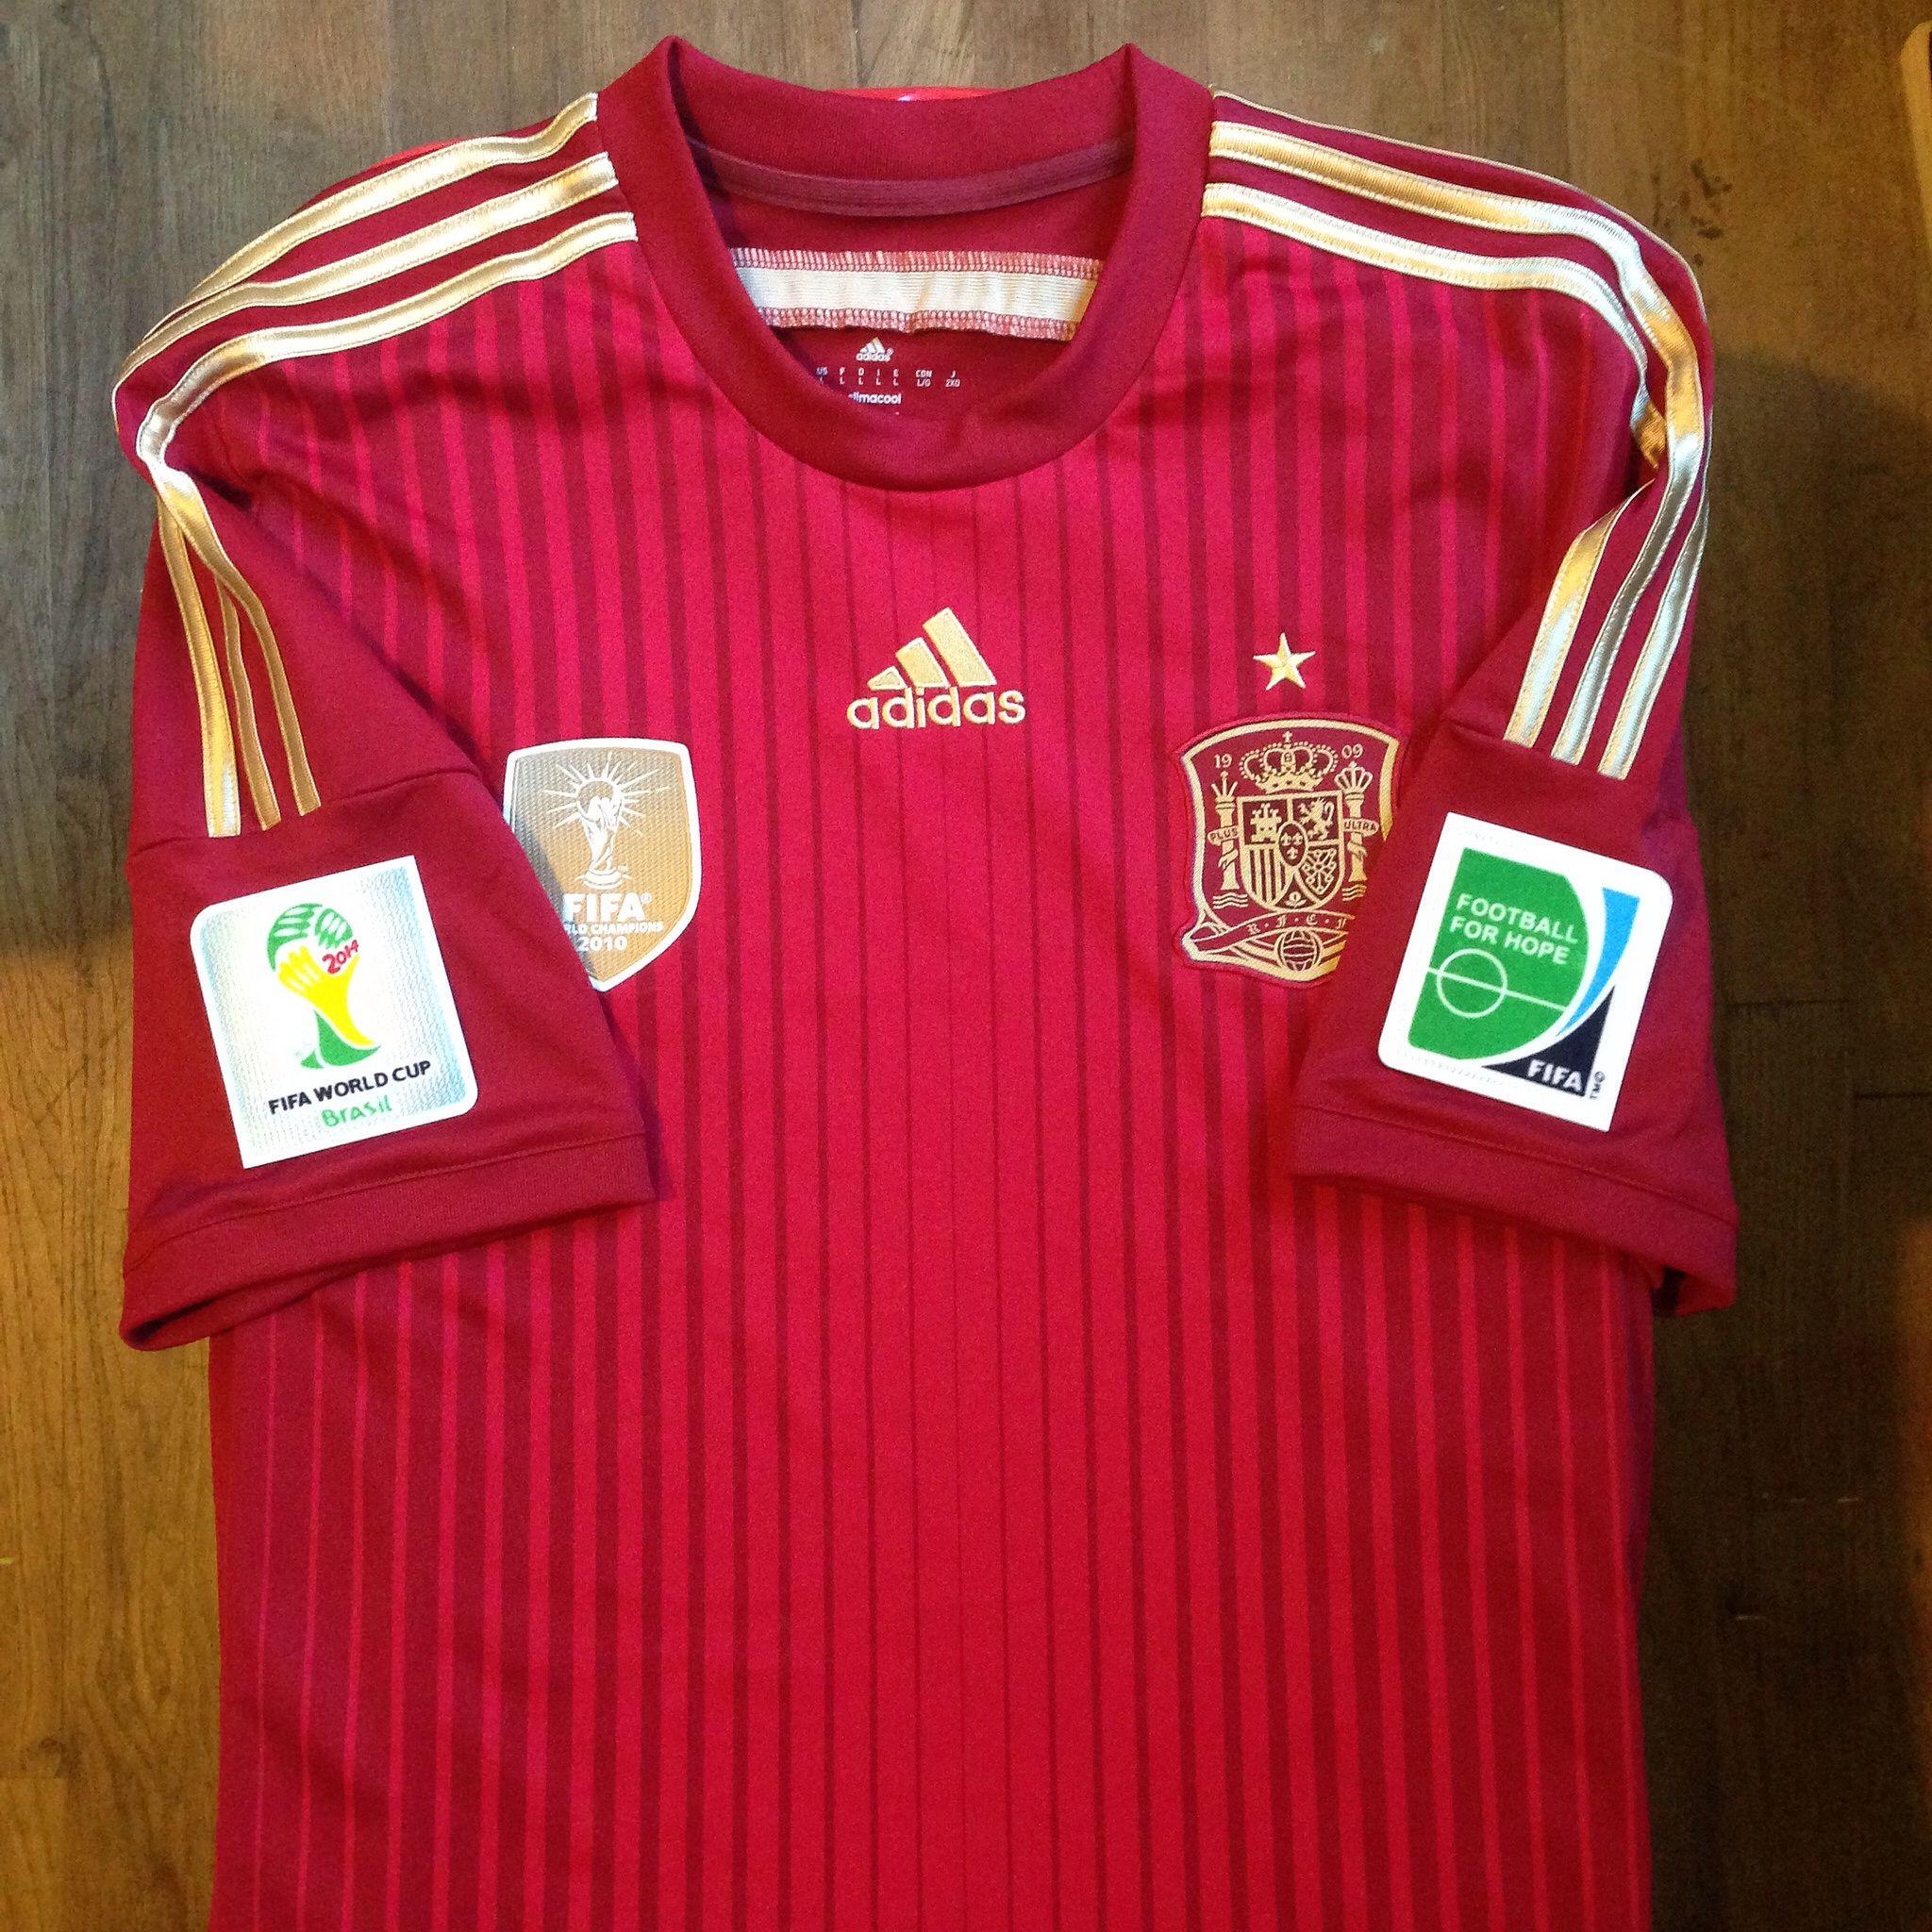 81bf002a59f 2014 Brazil FIFA World Cup Spain Home Jersey    Primera Equipación de la  Selección Española